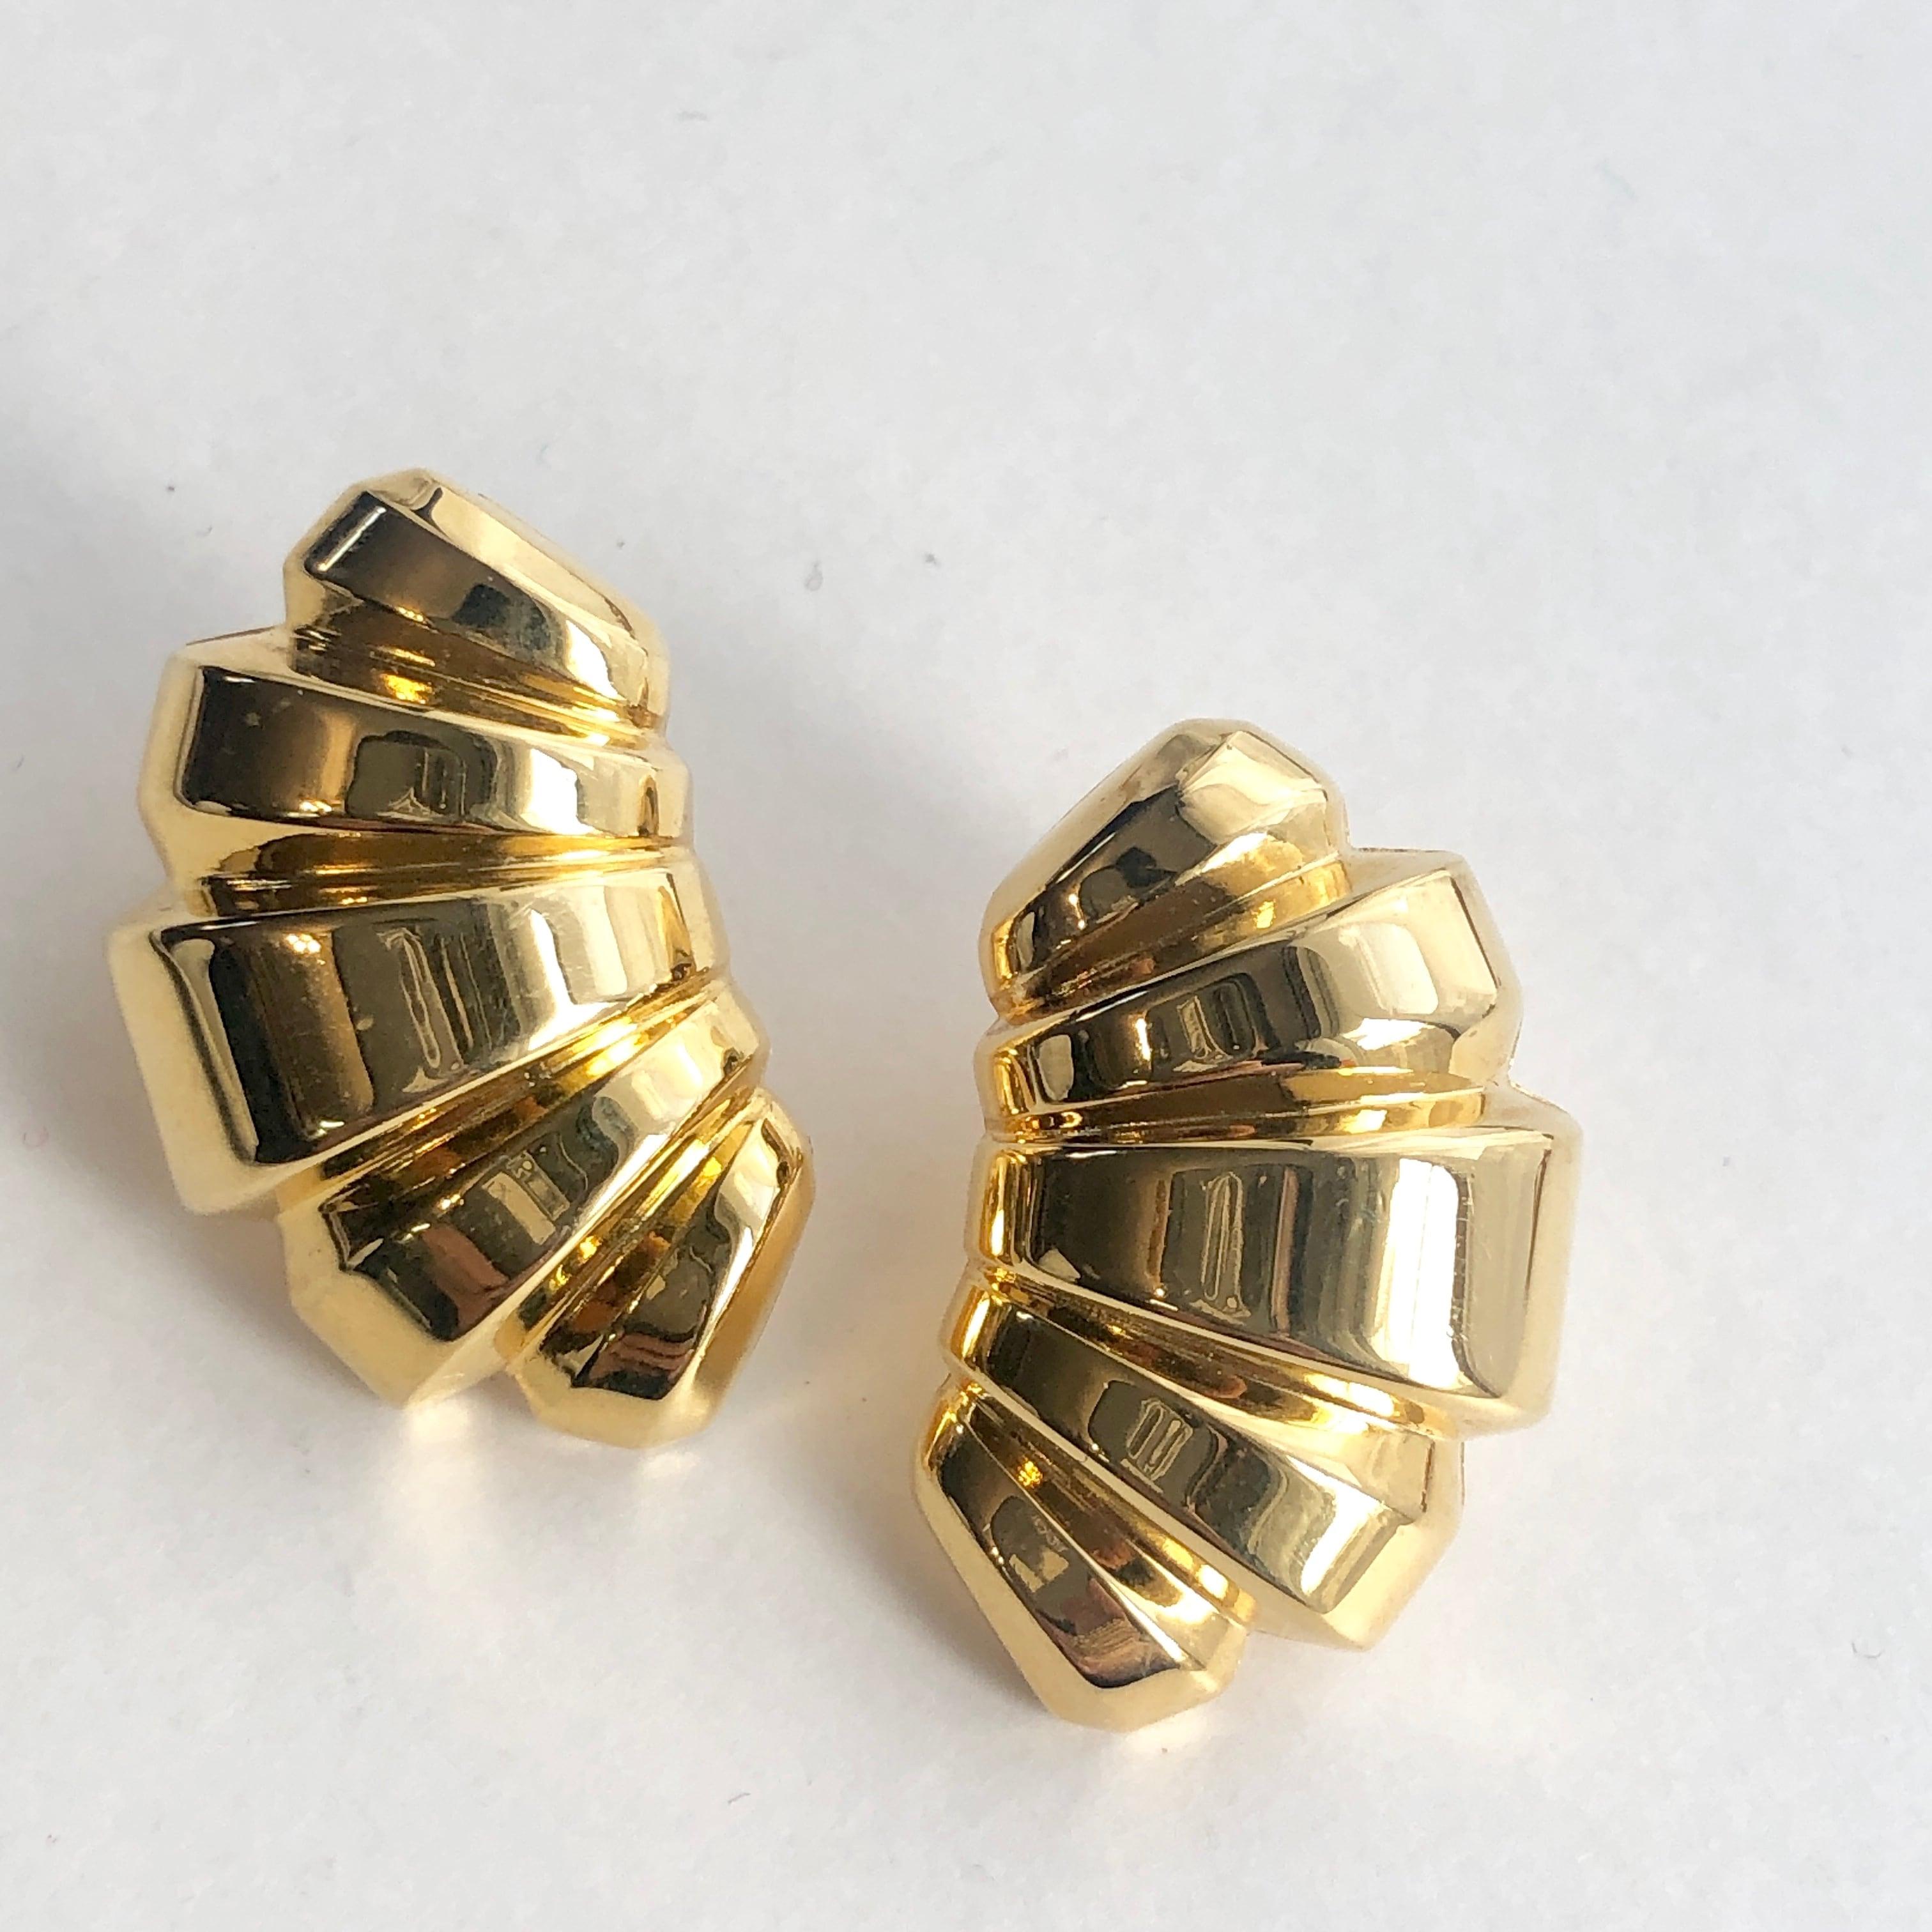 Vintage Monet croissant earrings B-039x